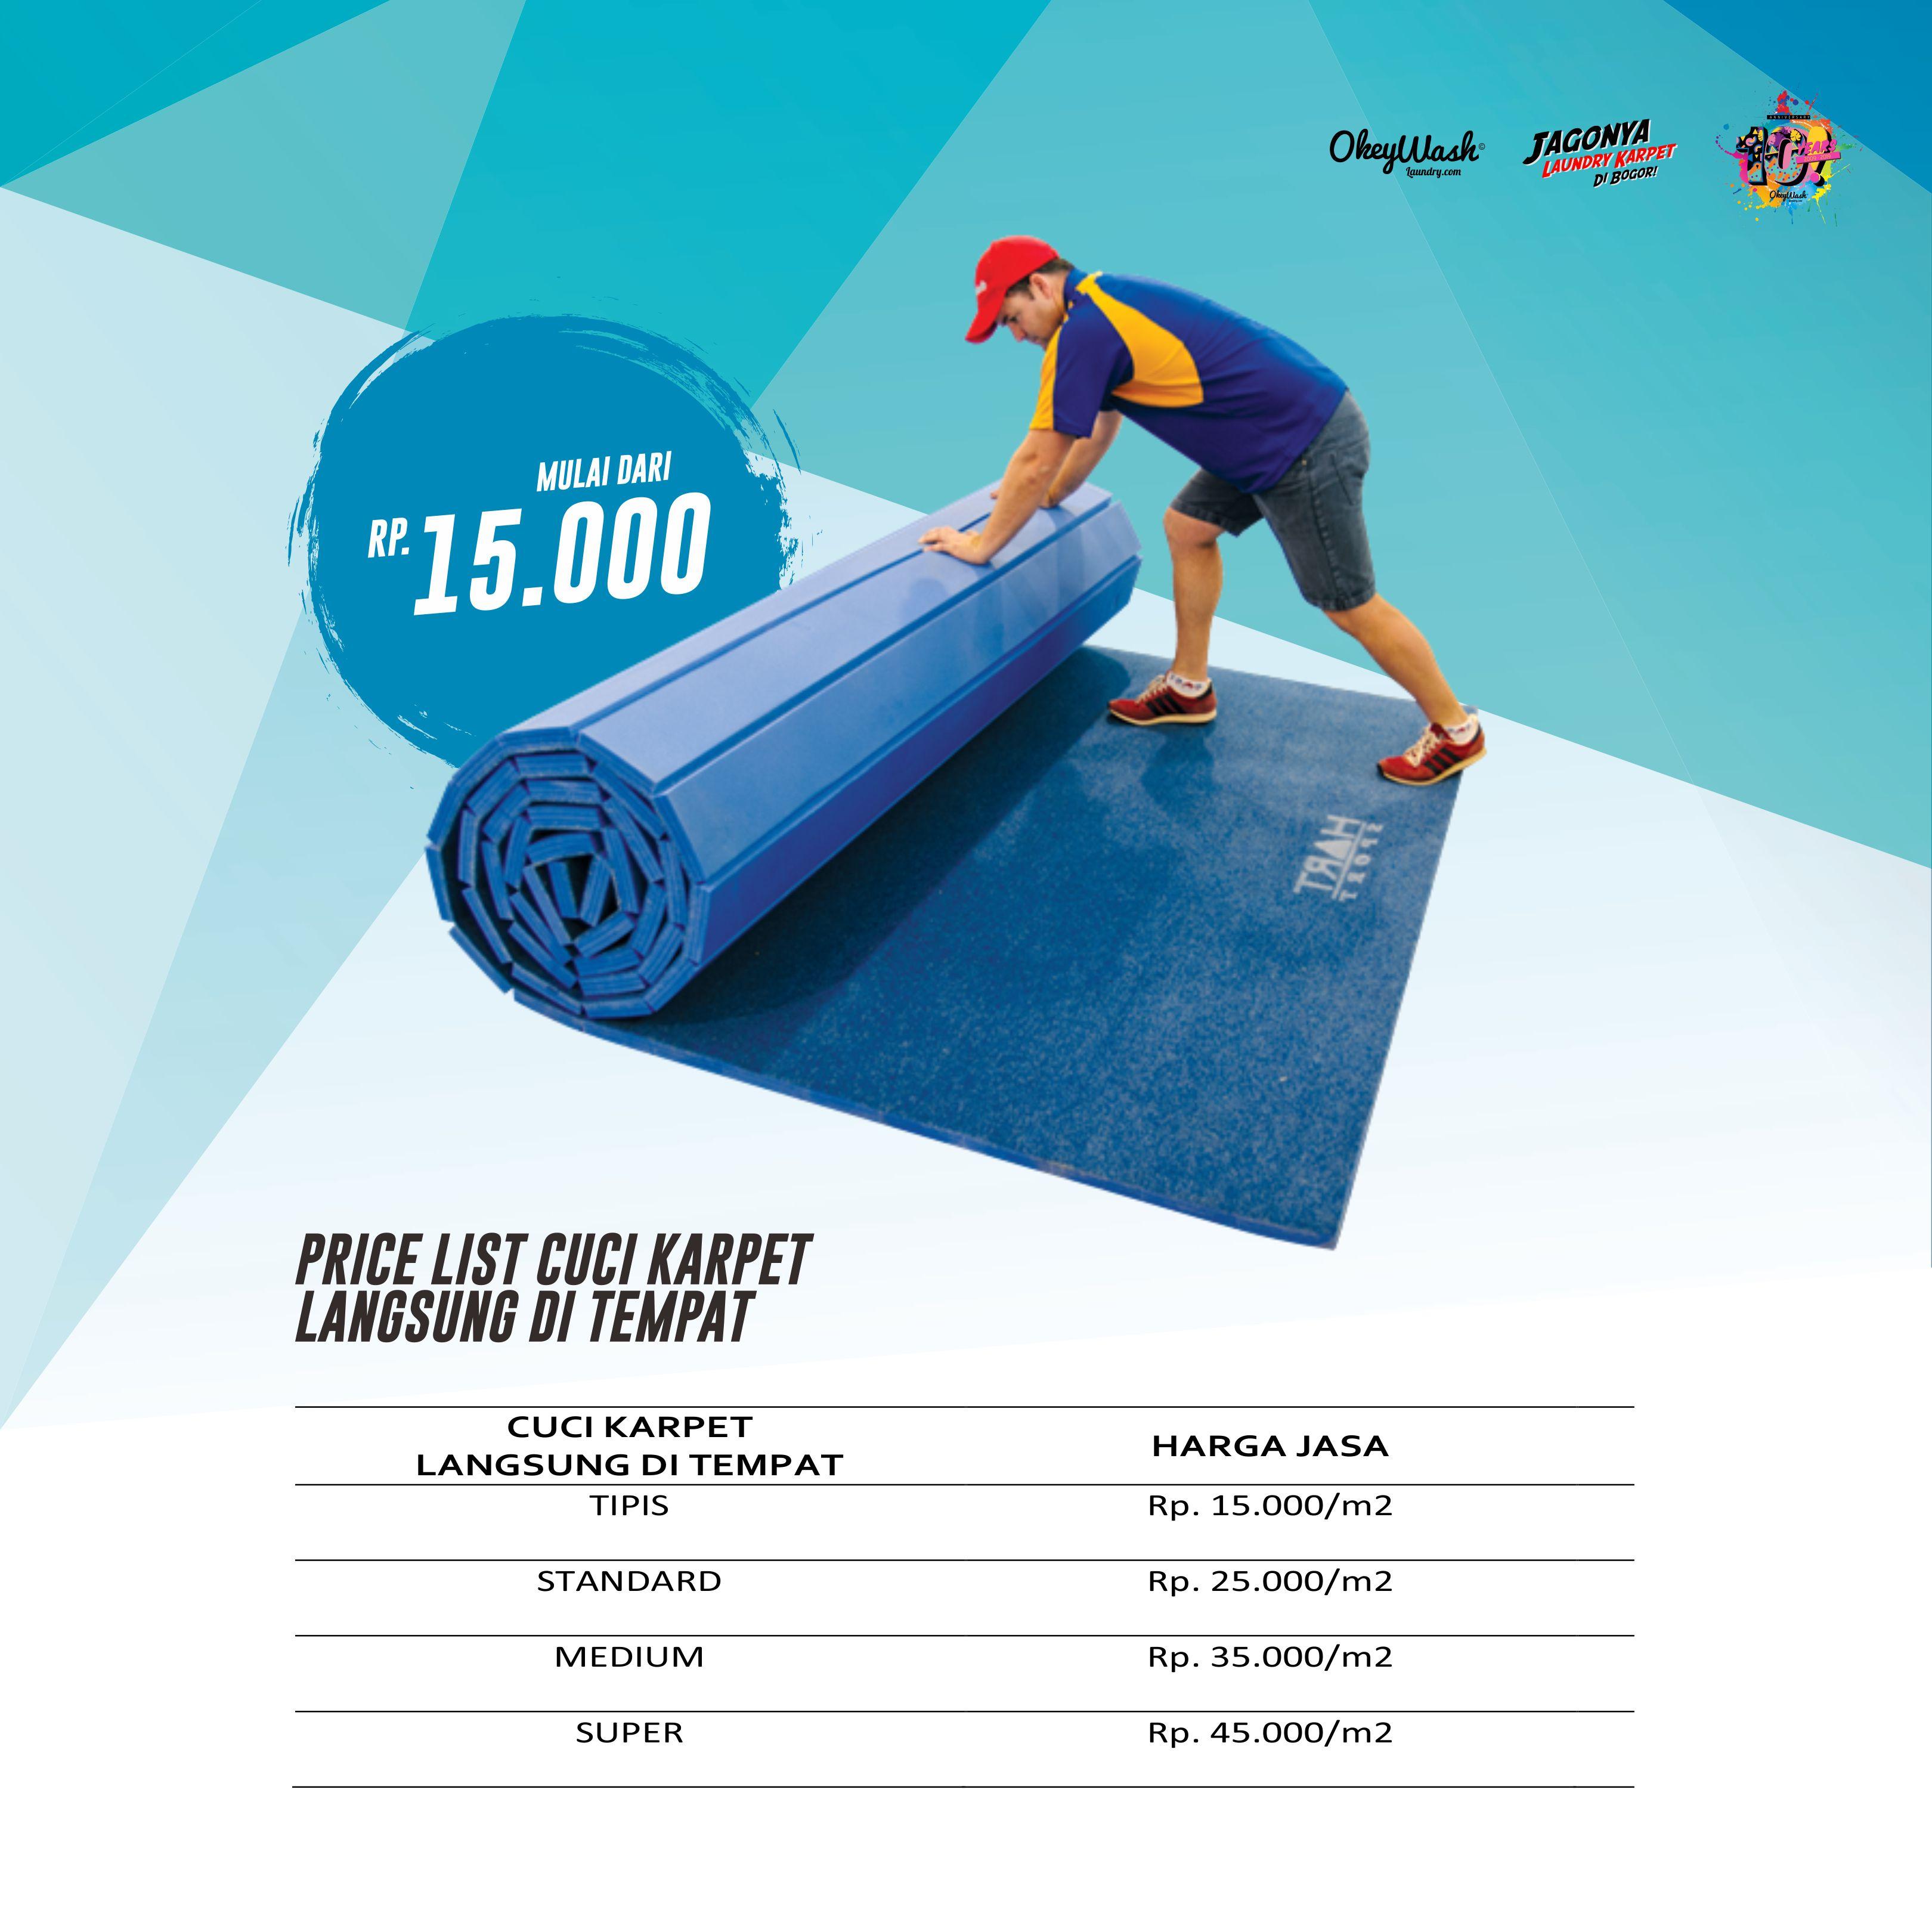 Price List Okey Wash Laundry 2019 - Cuci Karpet Langsung di Tempat